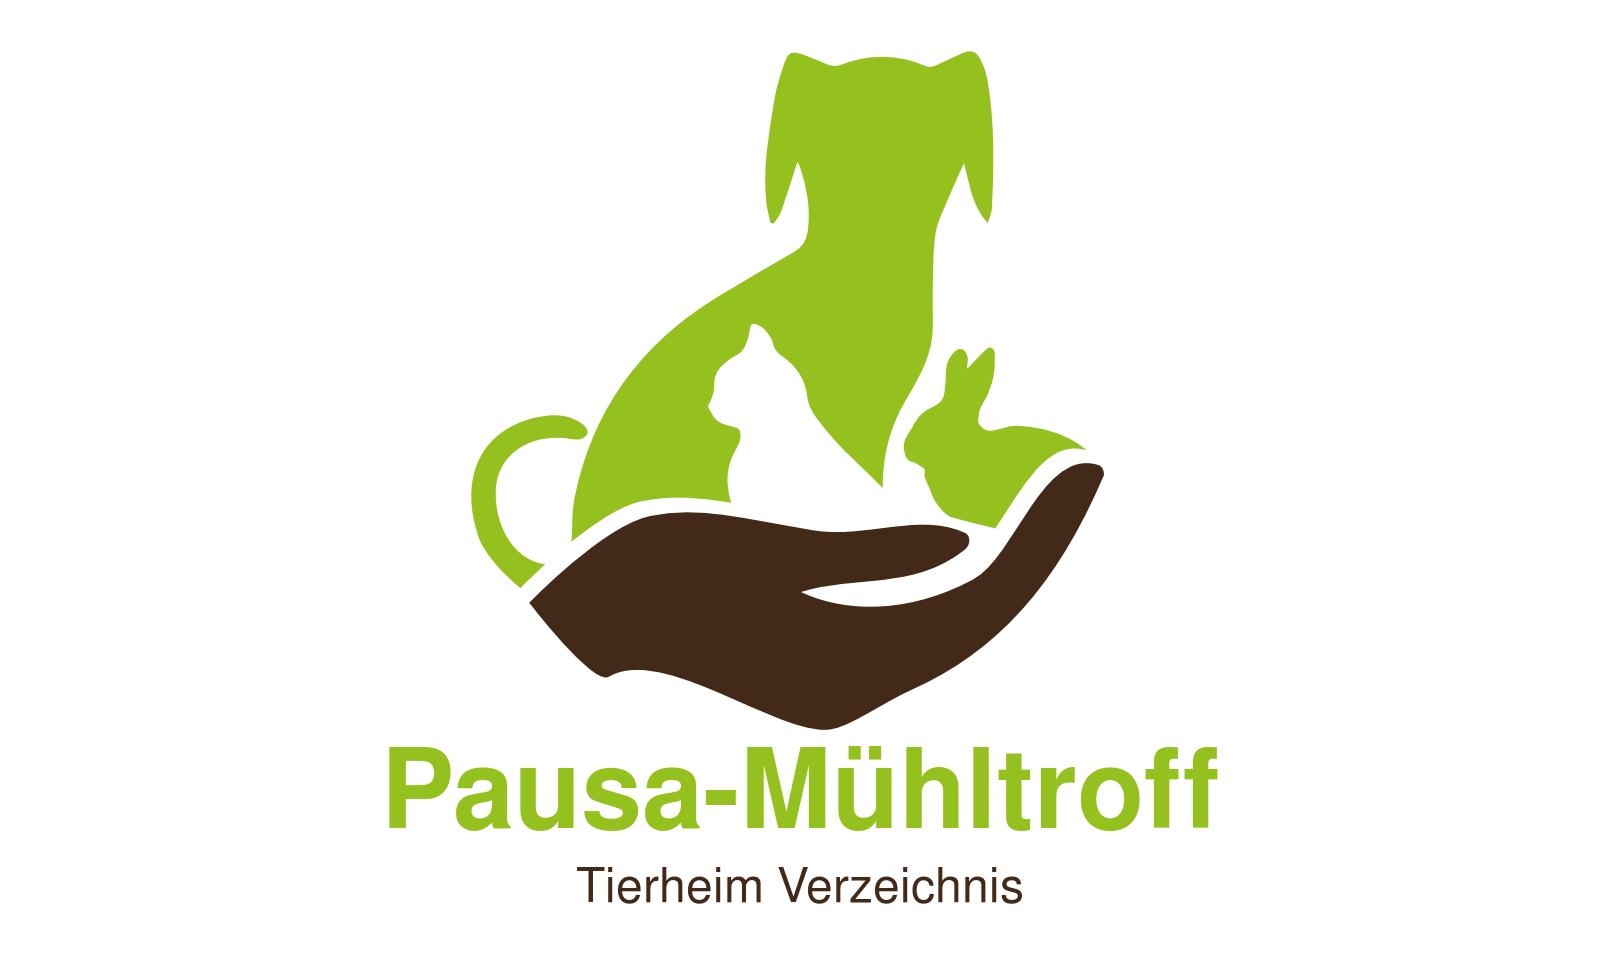 Tierheim Pausa-Mühltroff